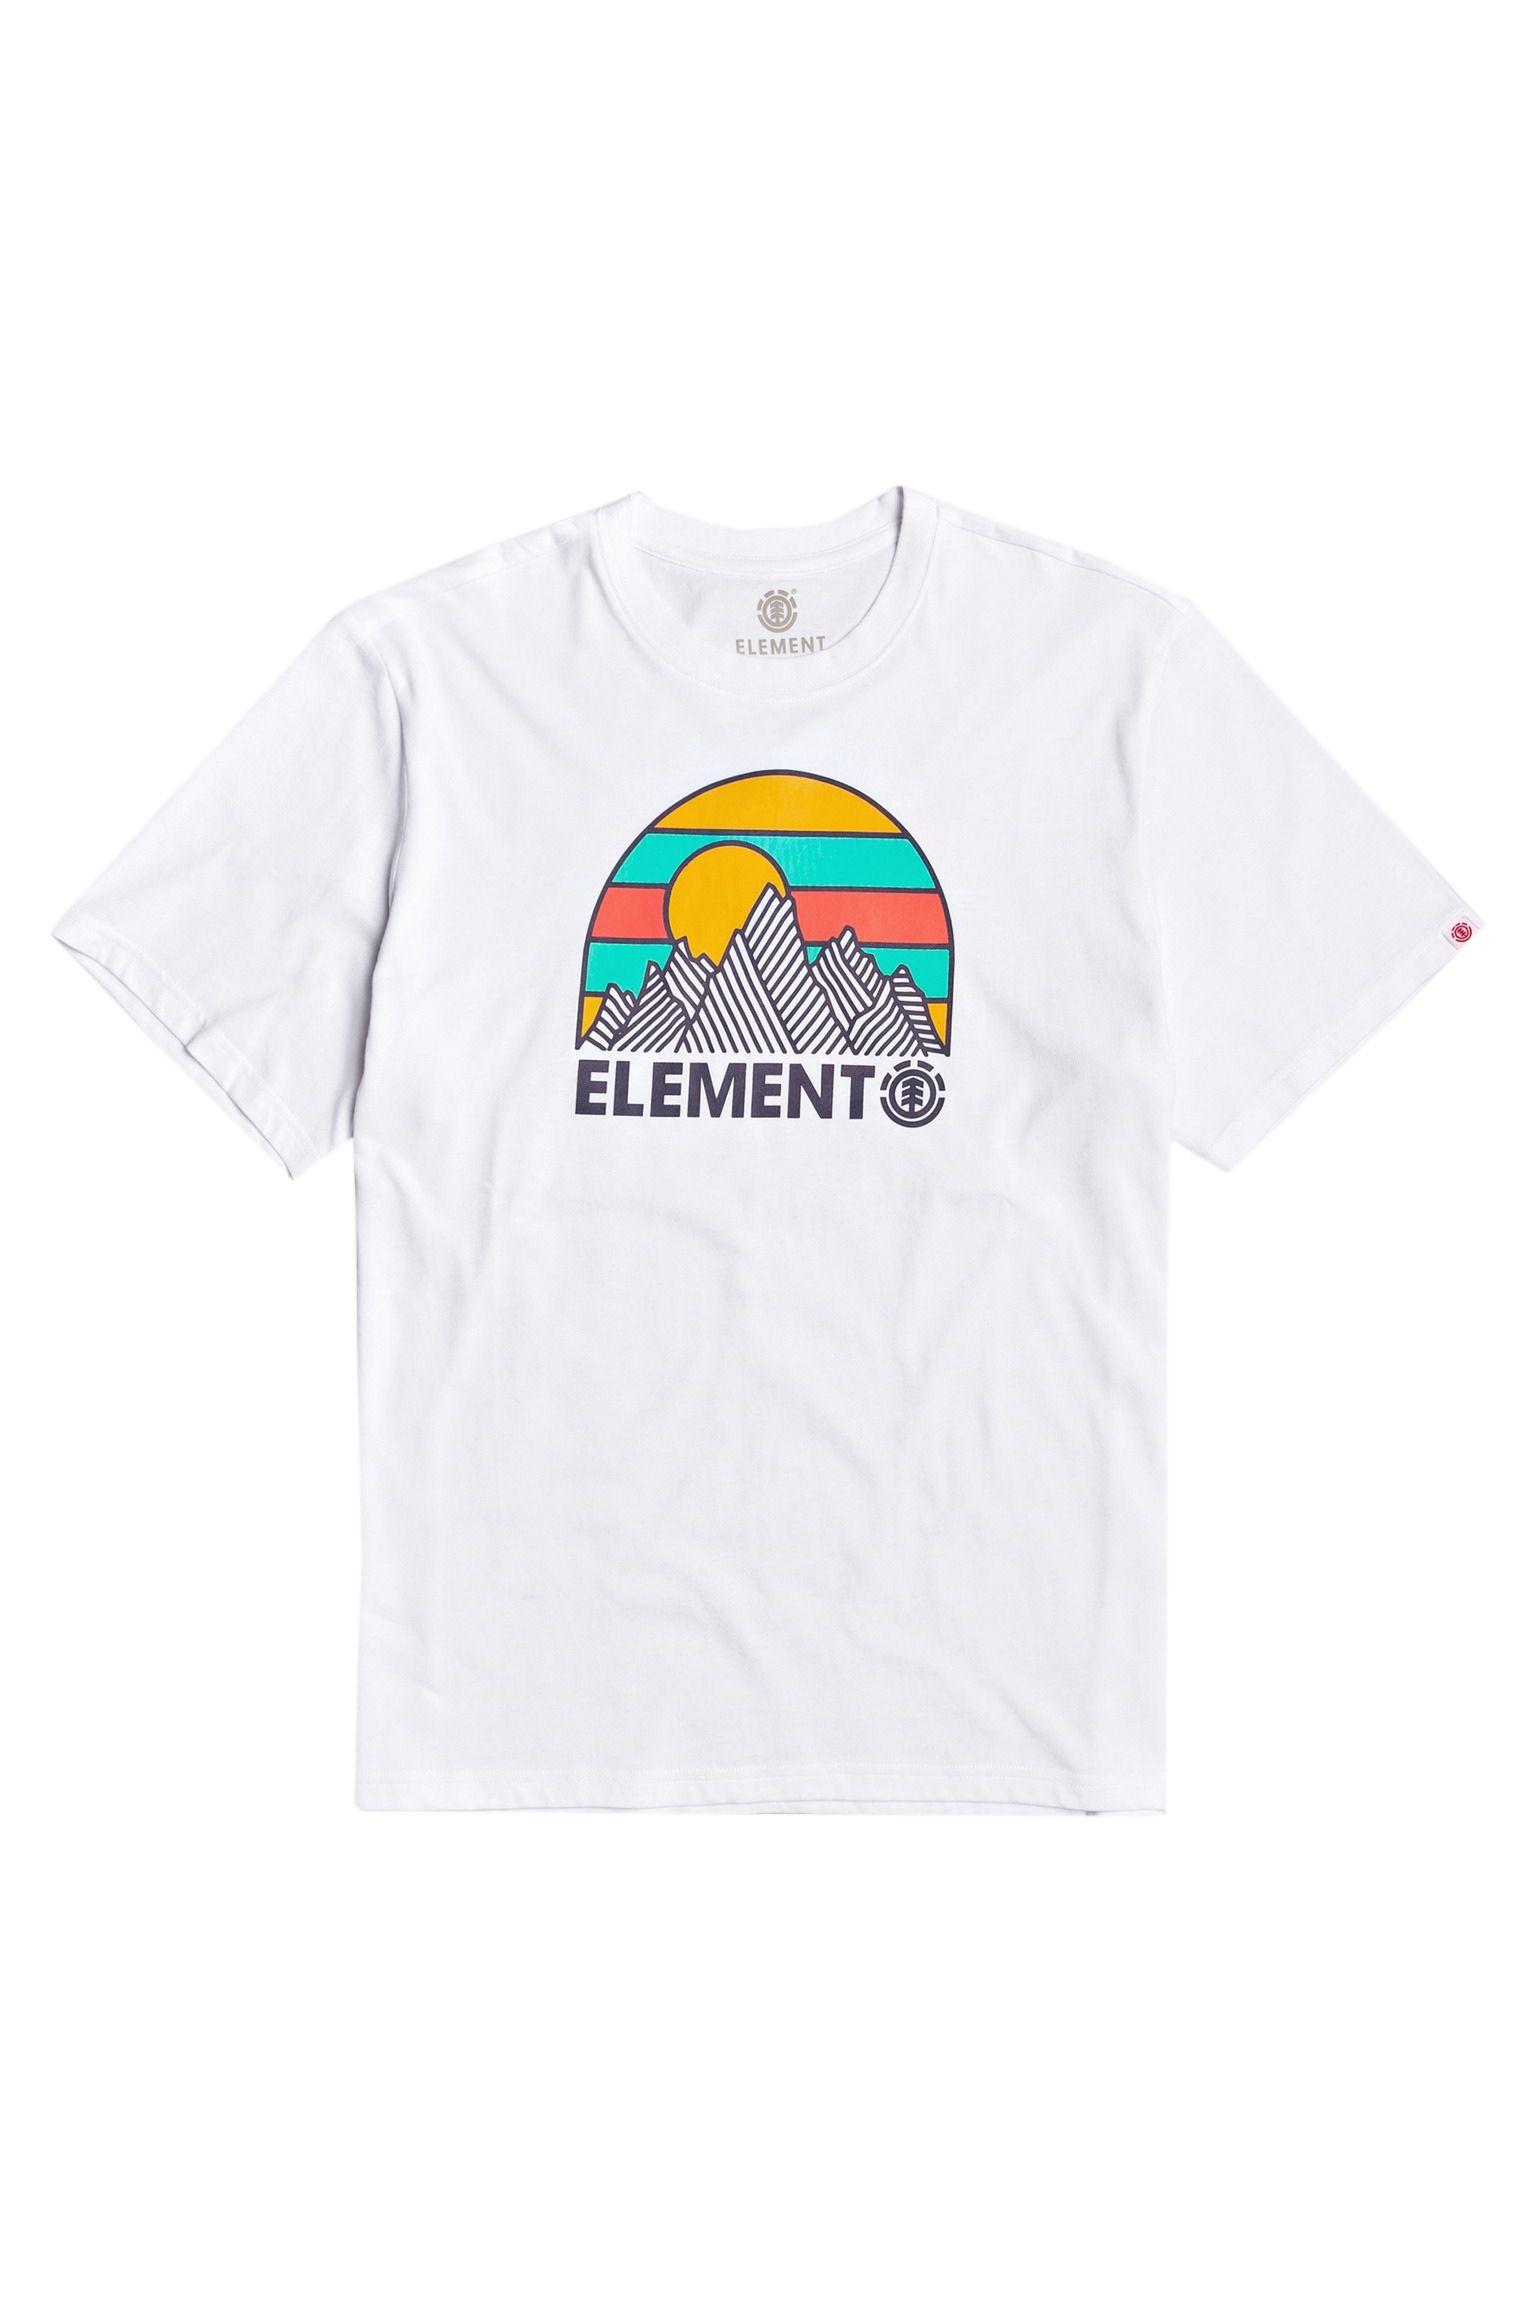 T-Shirt Element KOZY SPORTING GOOD PROGR. Optic White